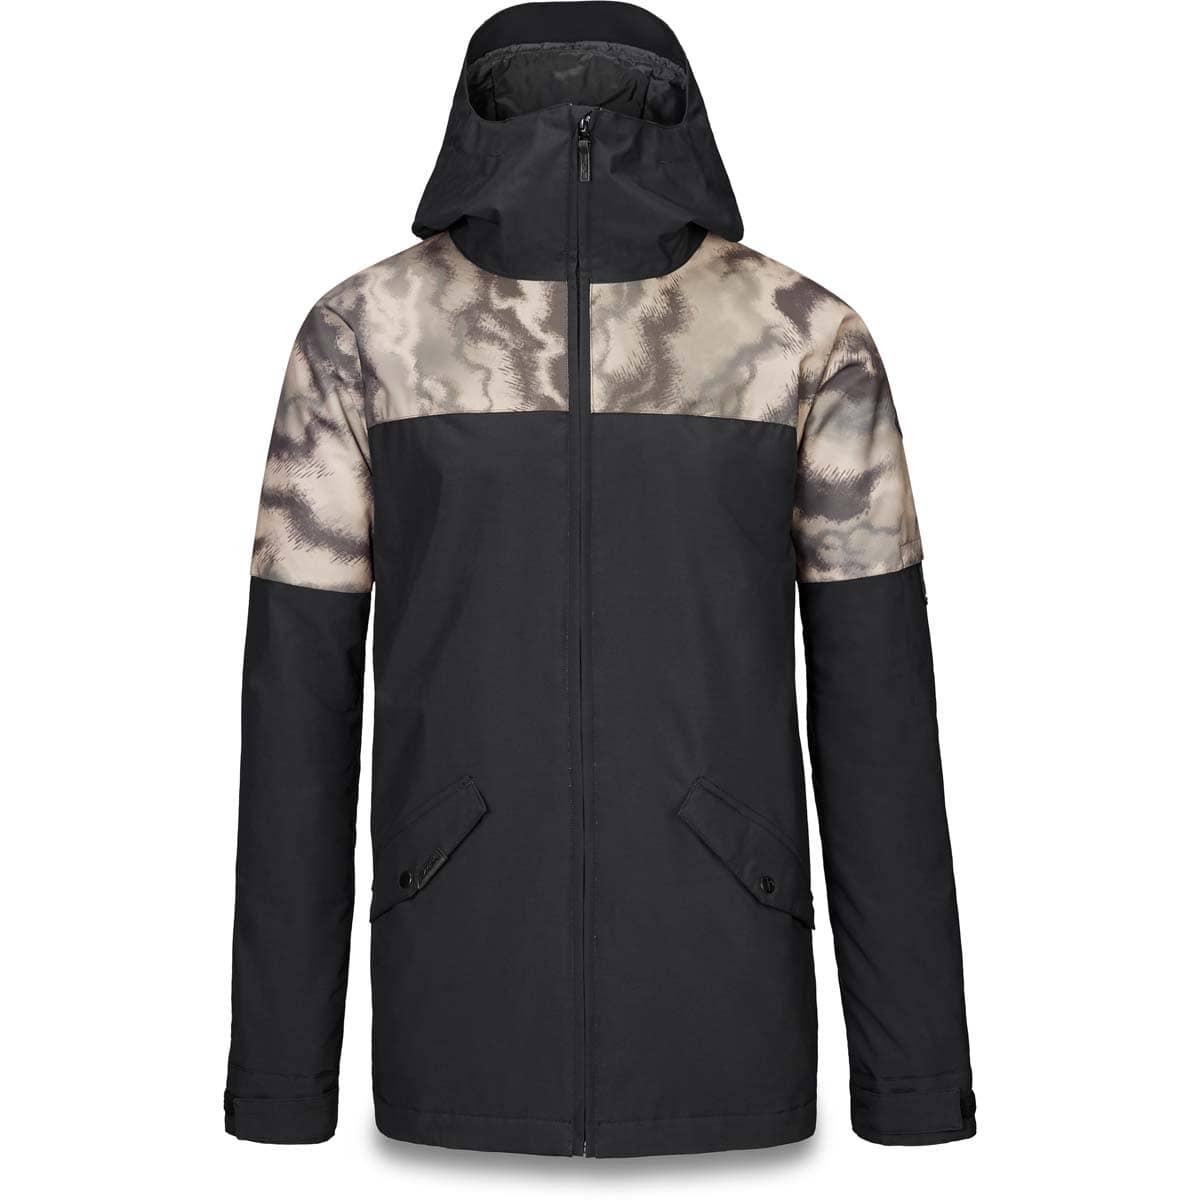 Dakine Denison Jacket Ski Snowboard Jacket Black Ashcroft Camo